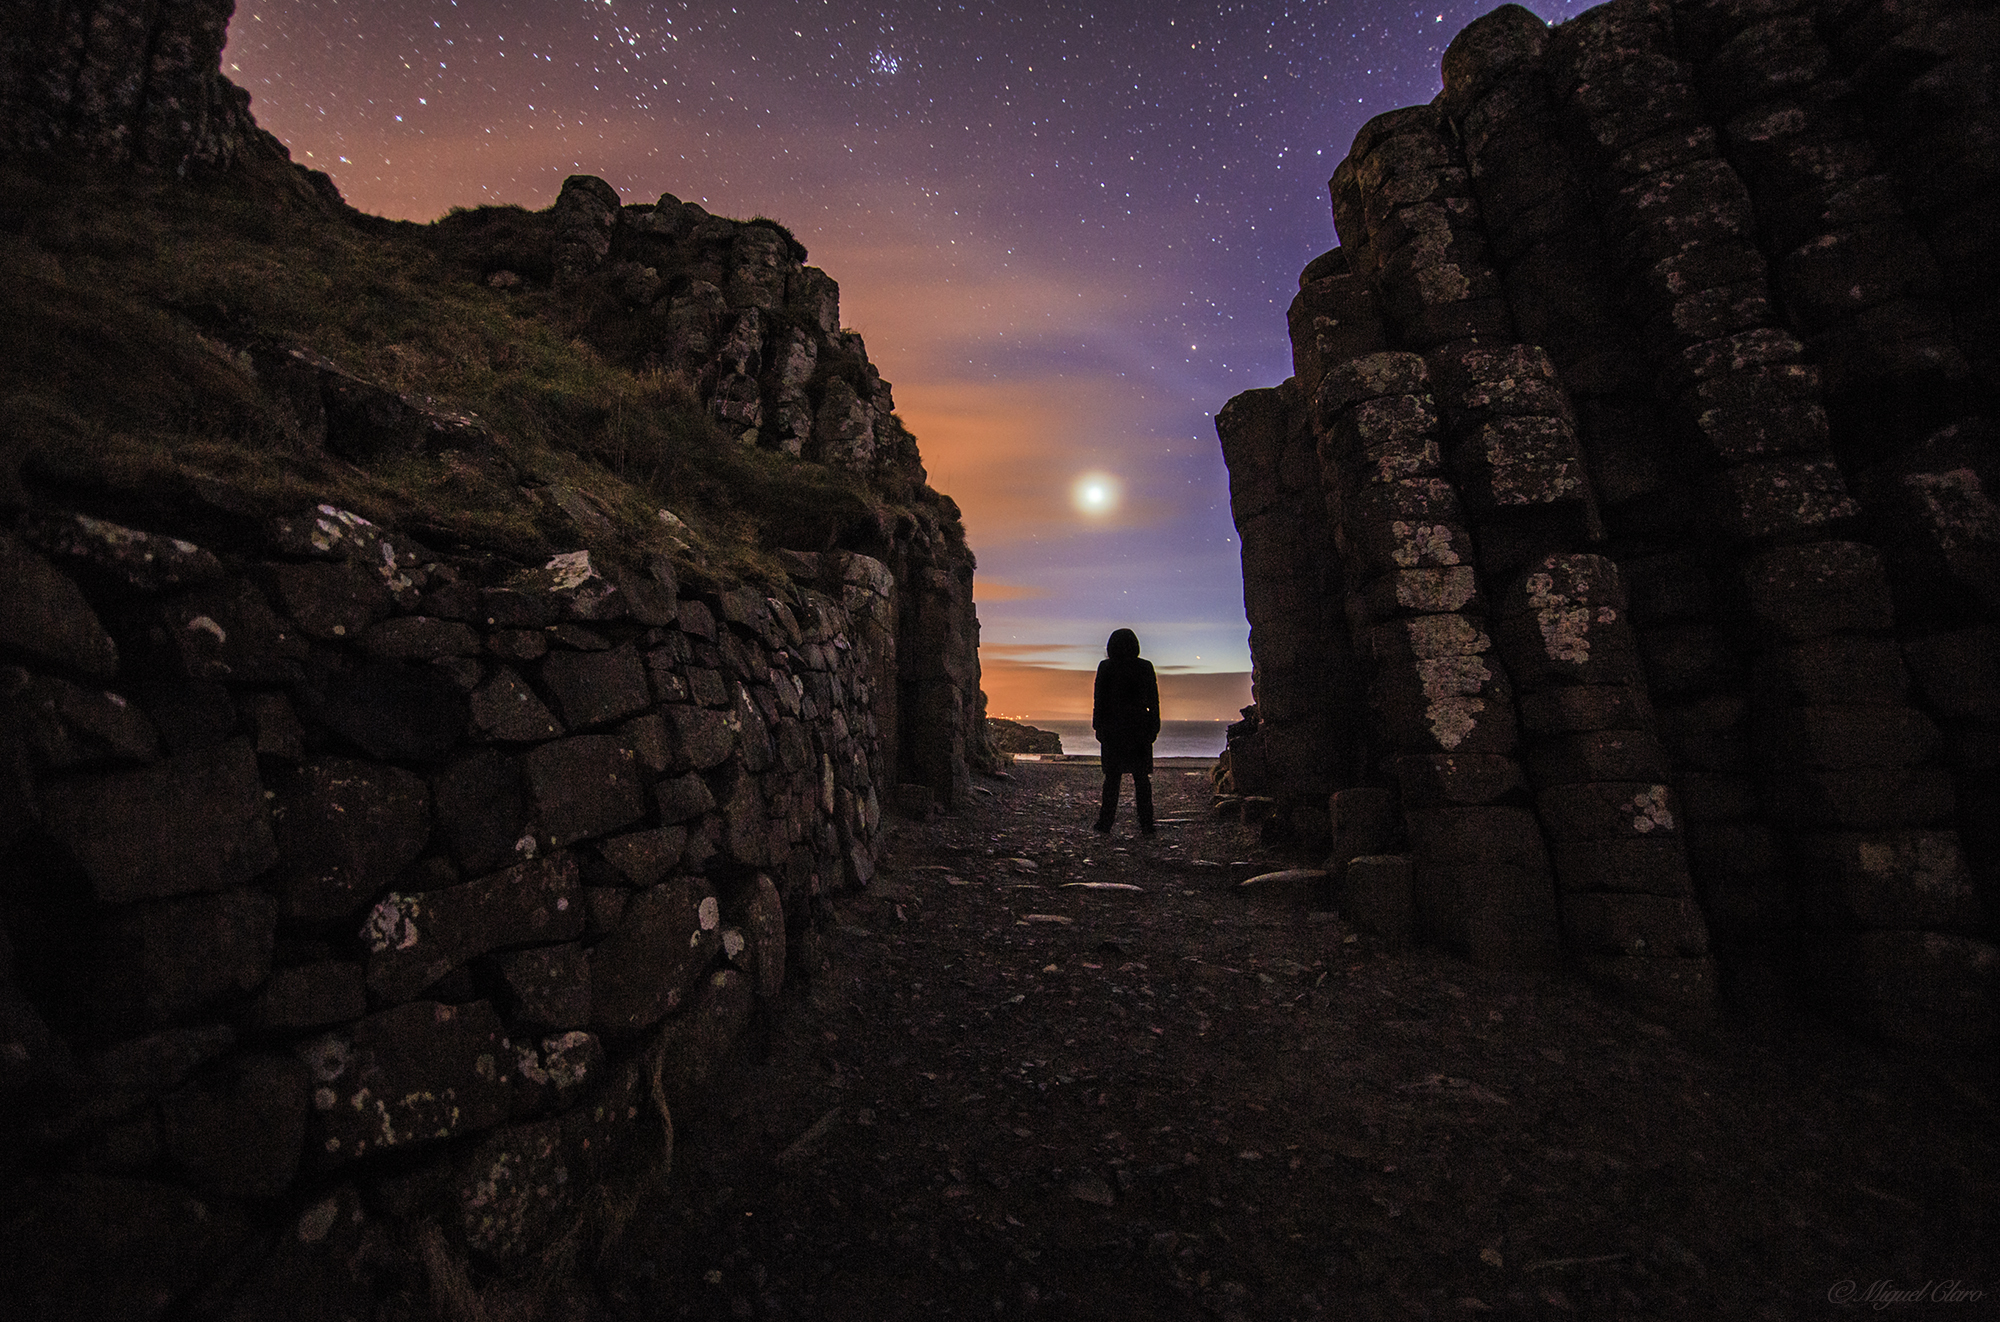 Stargazer Enjoys Venus View from Giant's Causeway in Ireland (Photo)